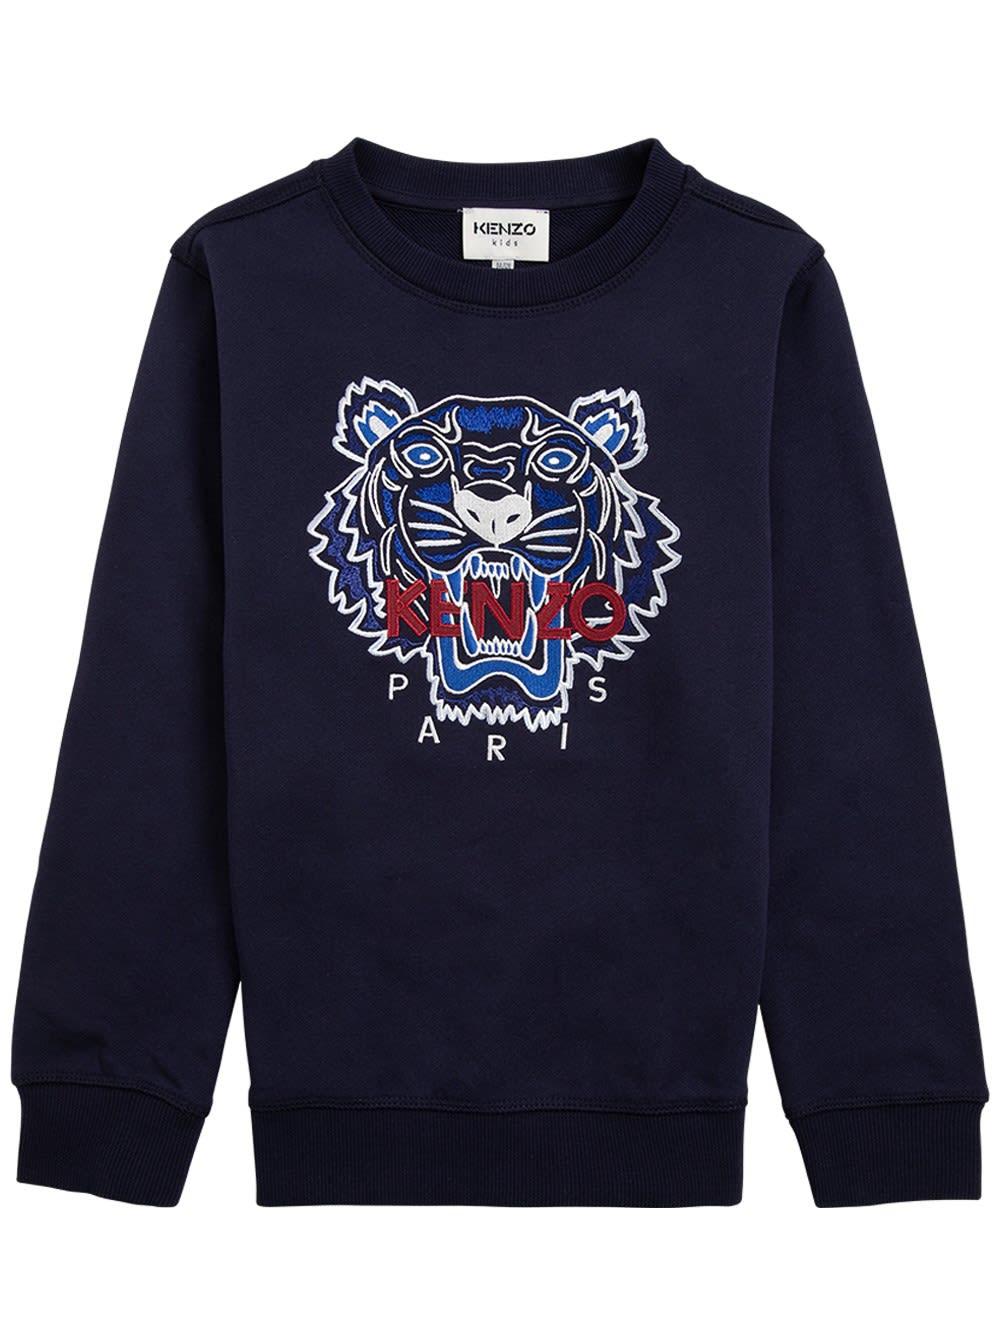 Blue Cotton Sweatshirt With Logo